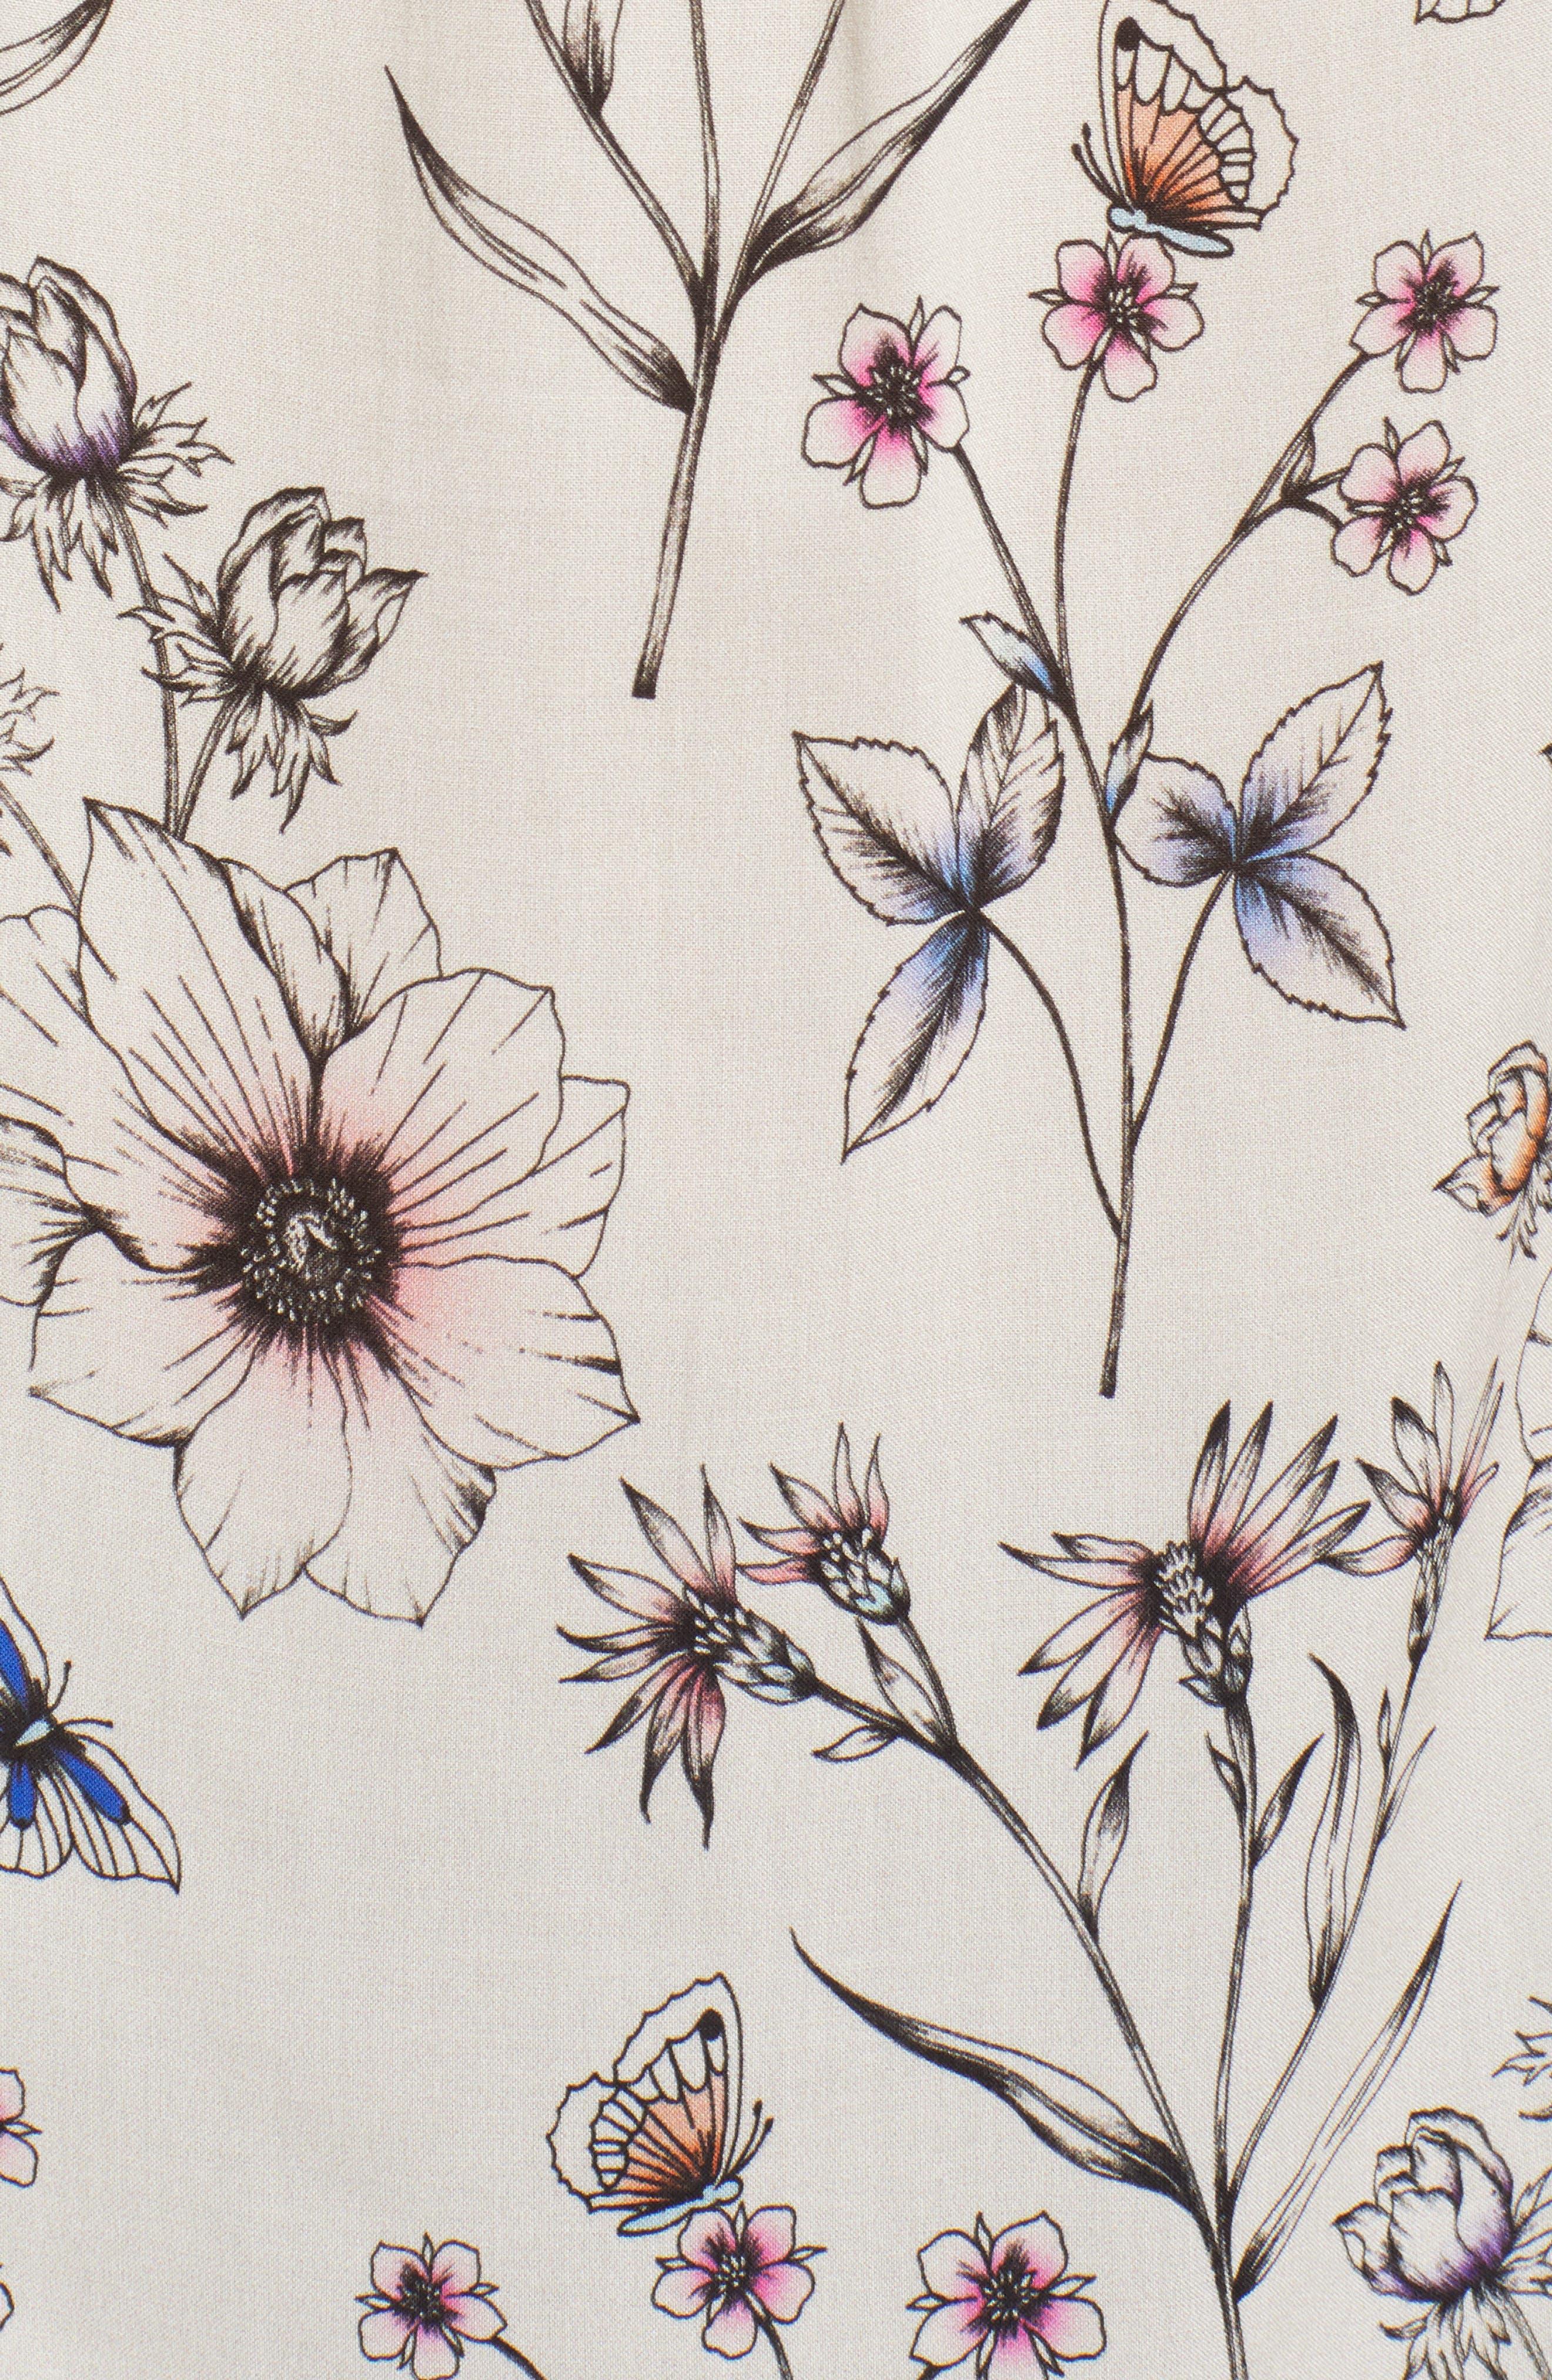 Floral Print Sleeveless Blouse,                             Alternate thumbnail 6, color,                             900